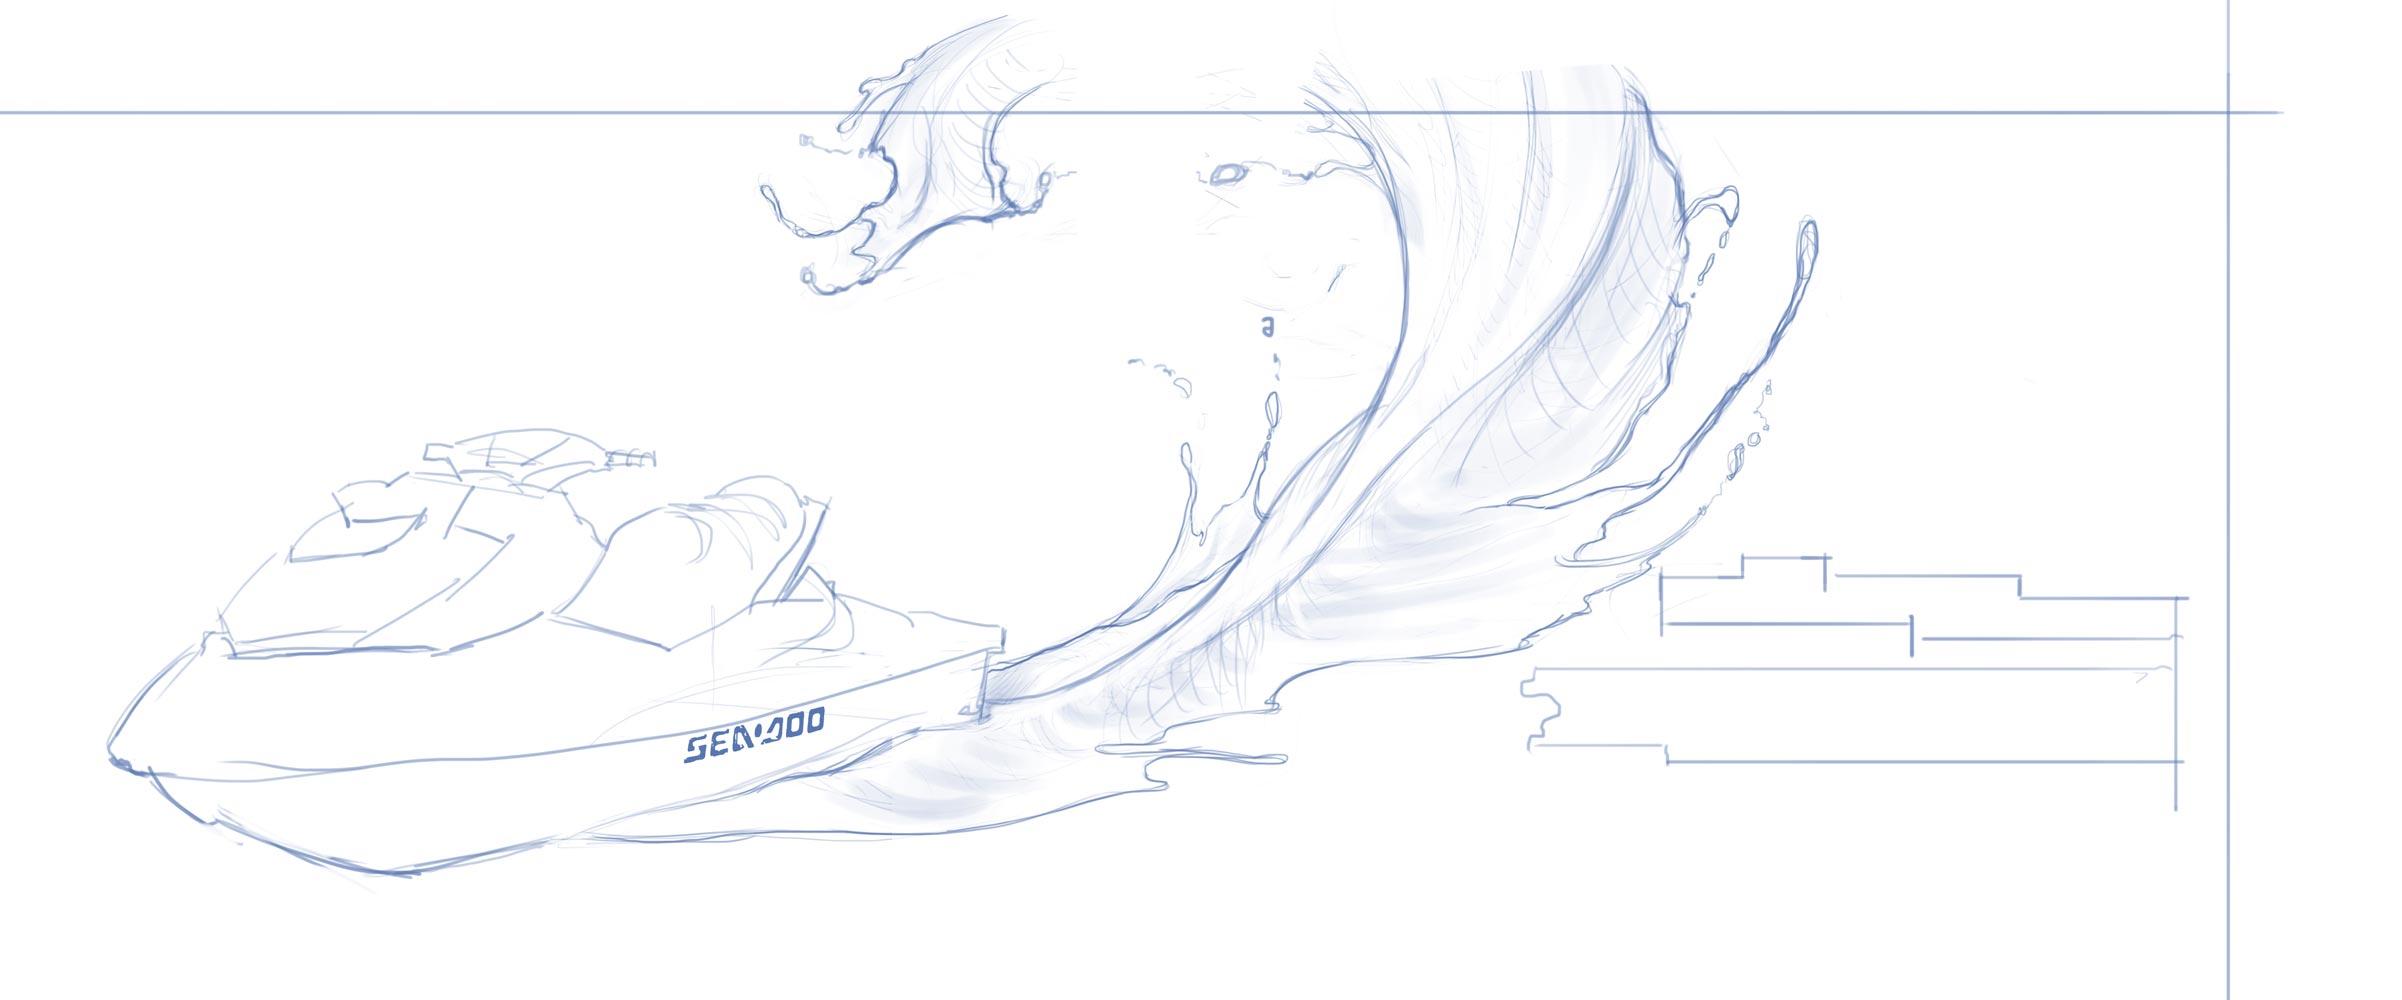 Sea-Doo Spark Paint Design sketch